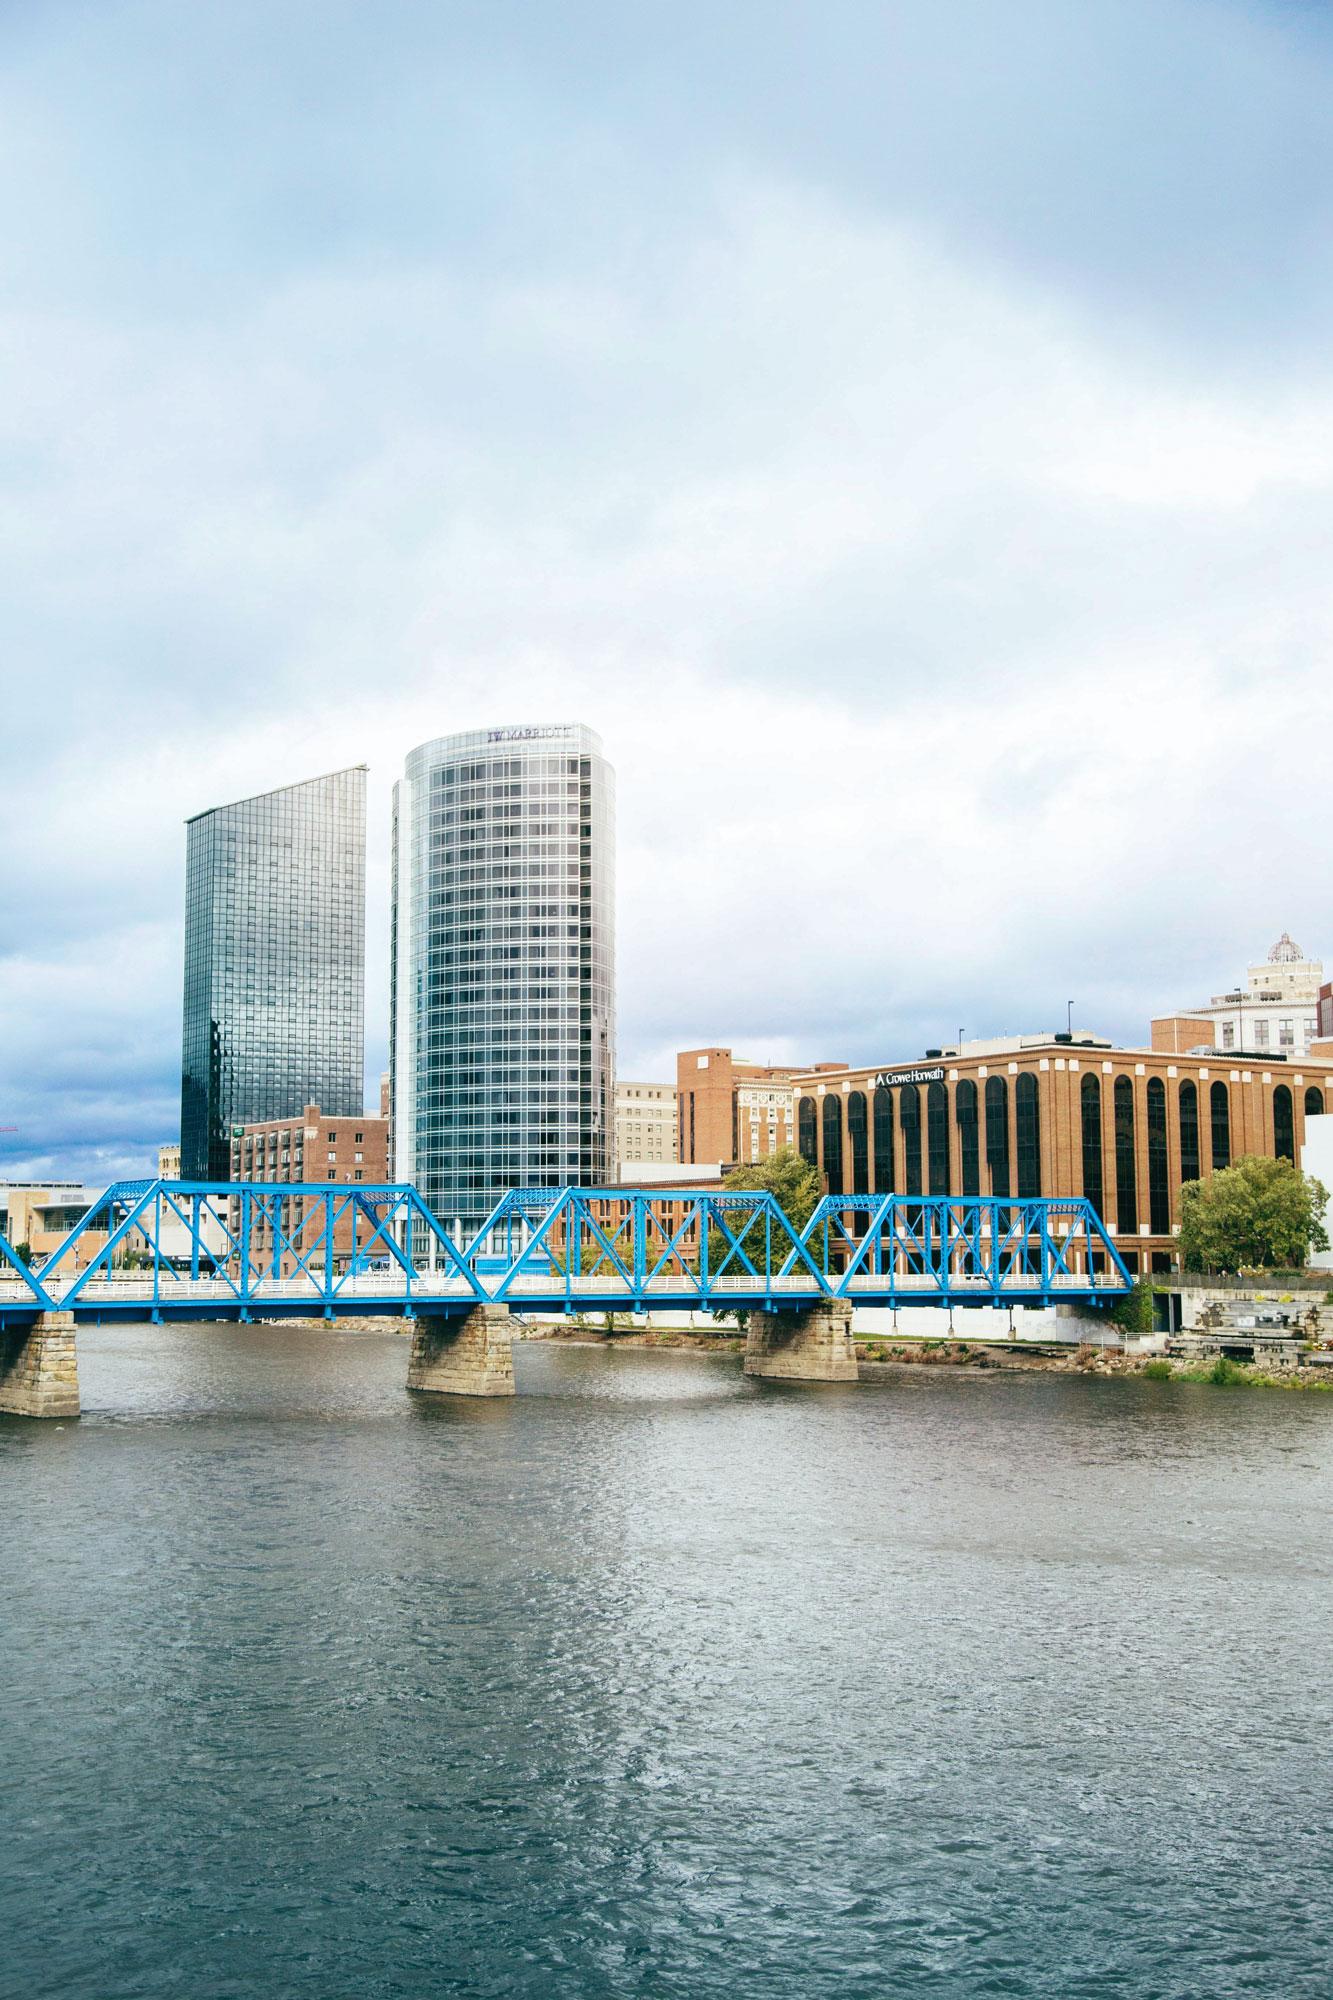 Blue bridge over river near city buildings during daytime photo. (Grand Rapids, Michigan)